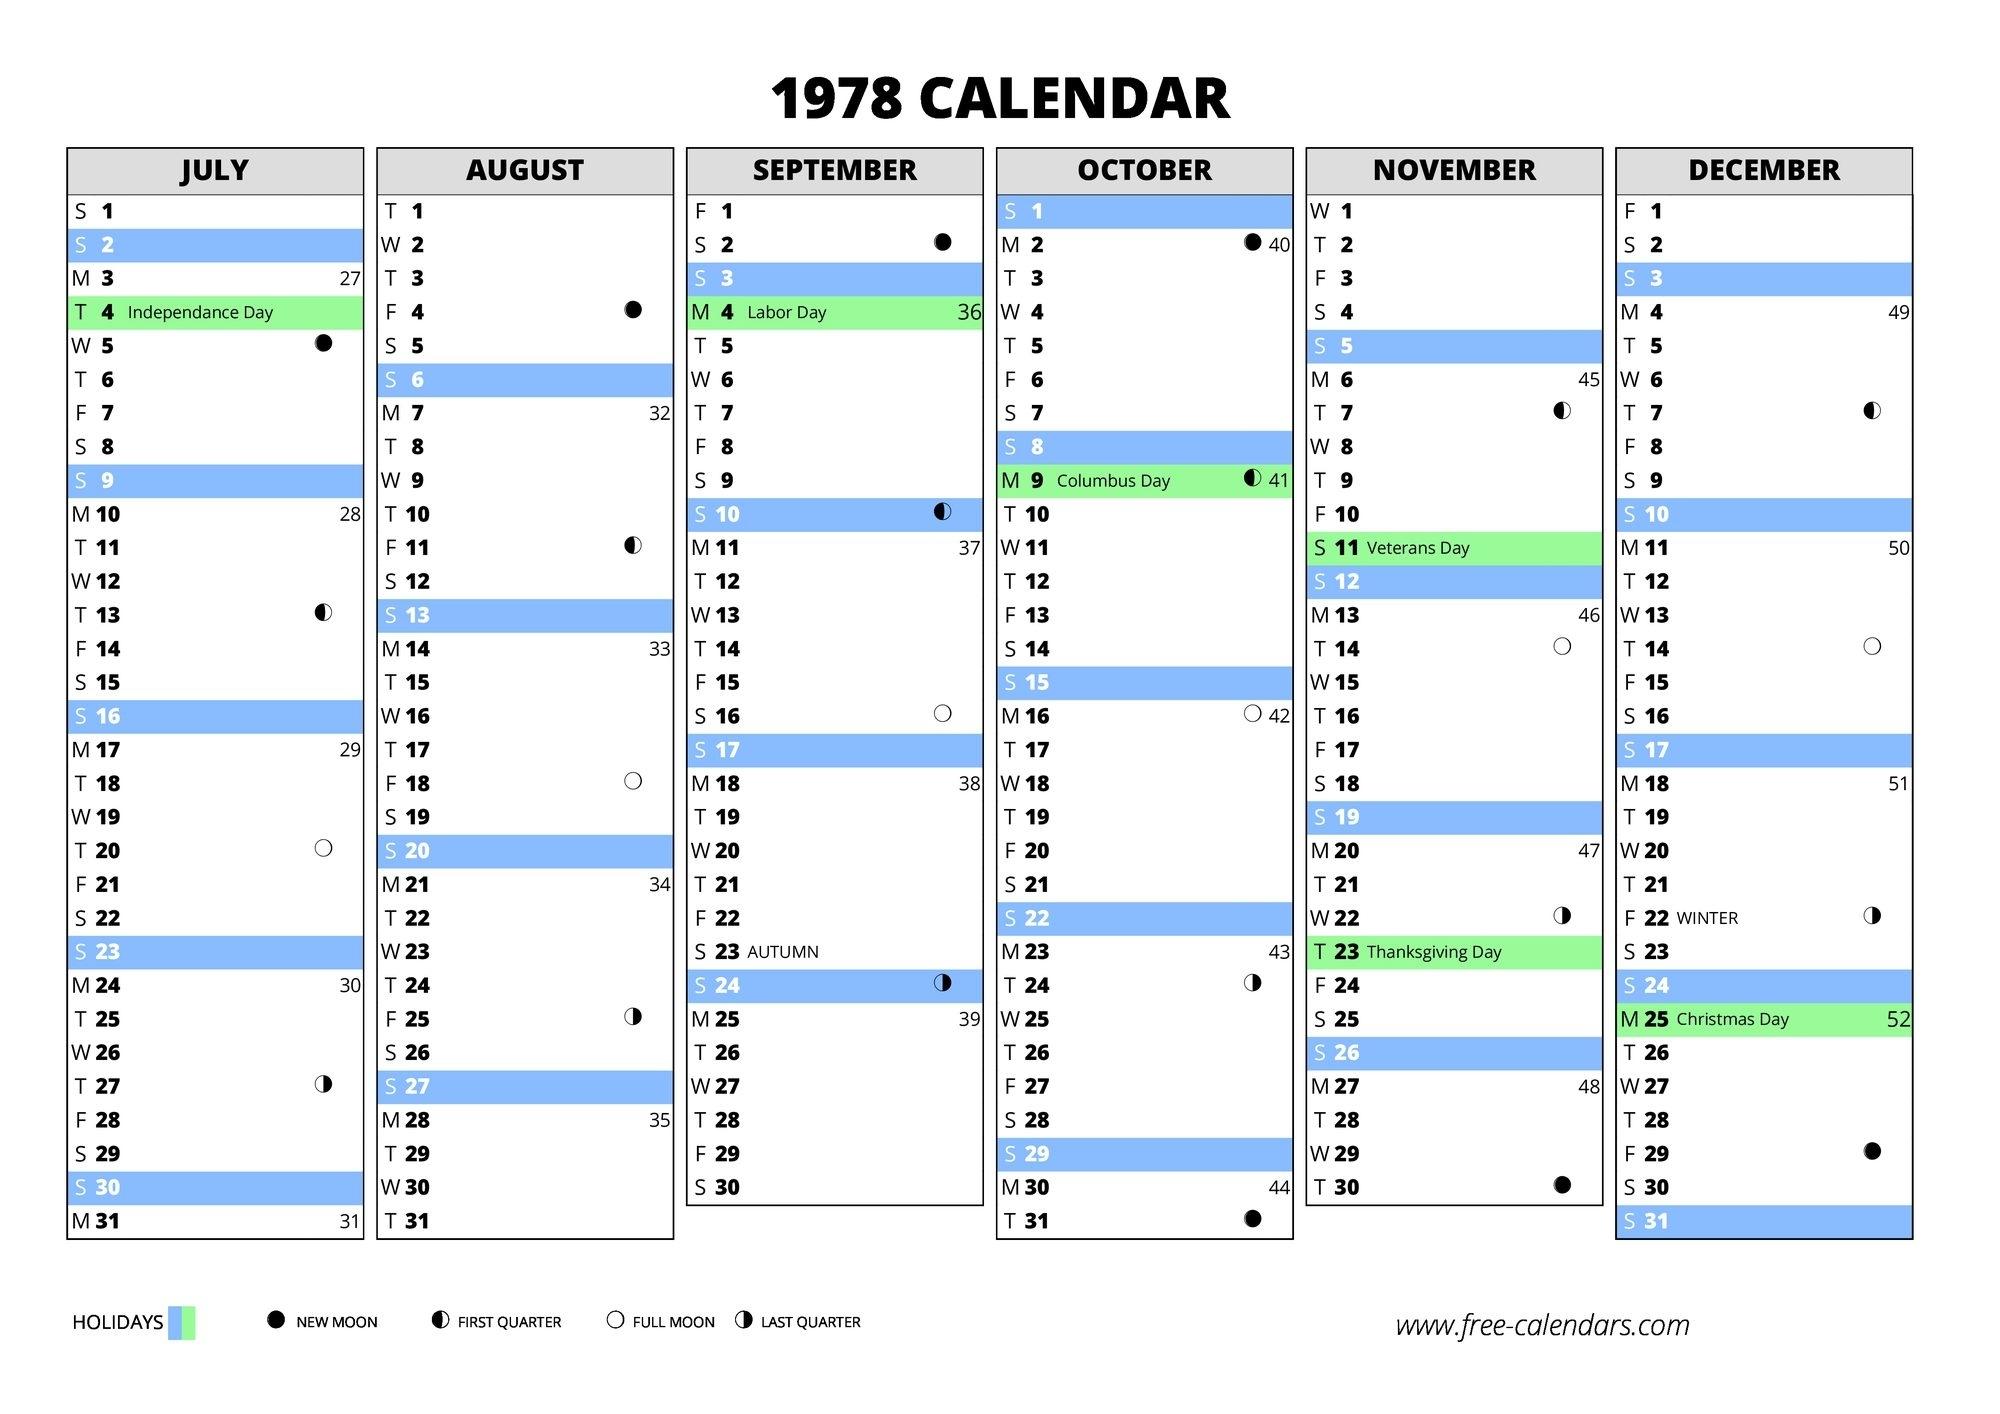 1978 Calendar ≡ Free-Calendars